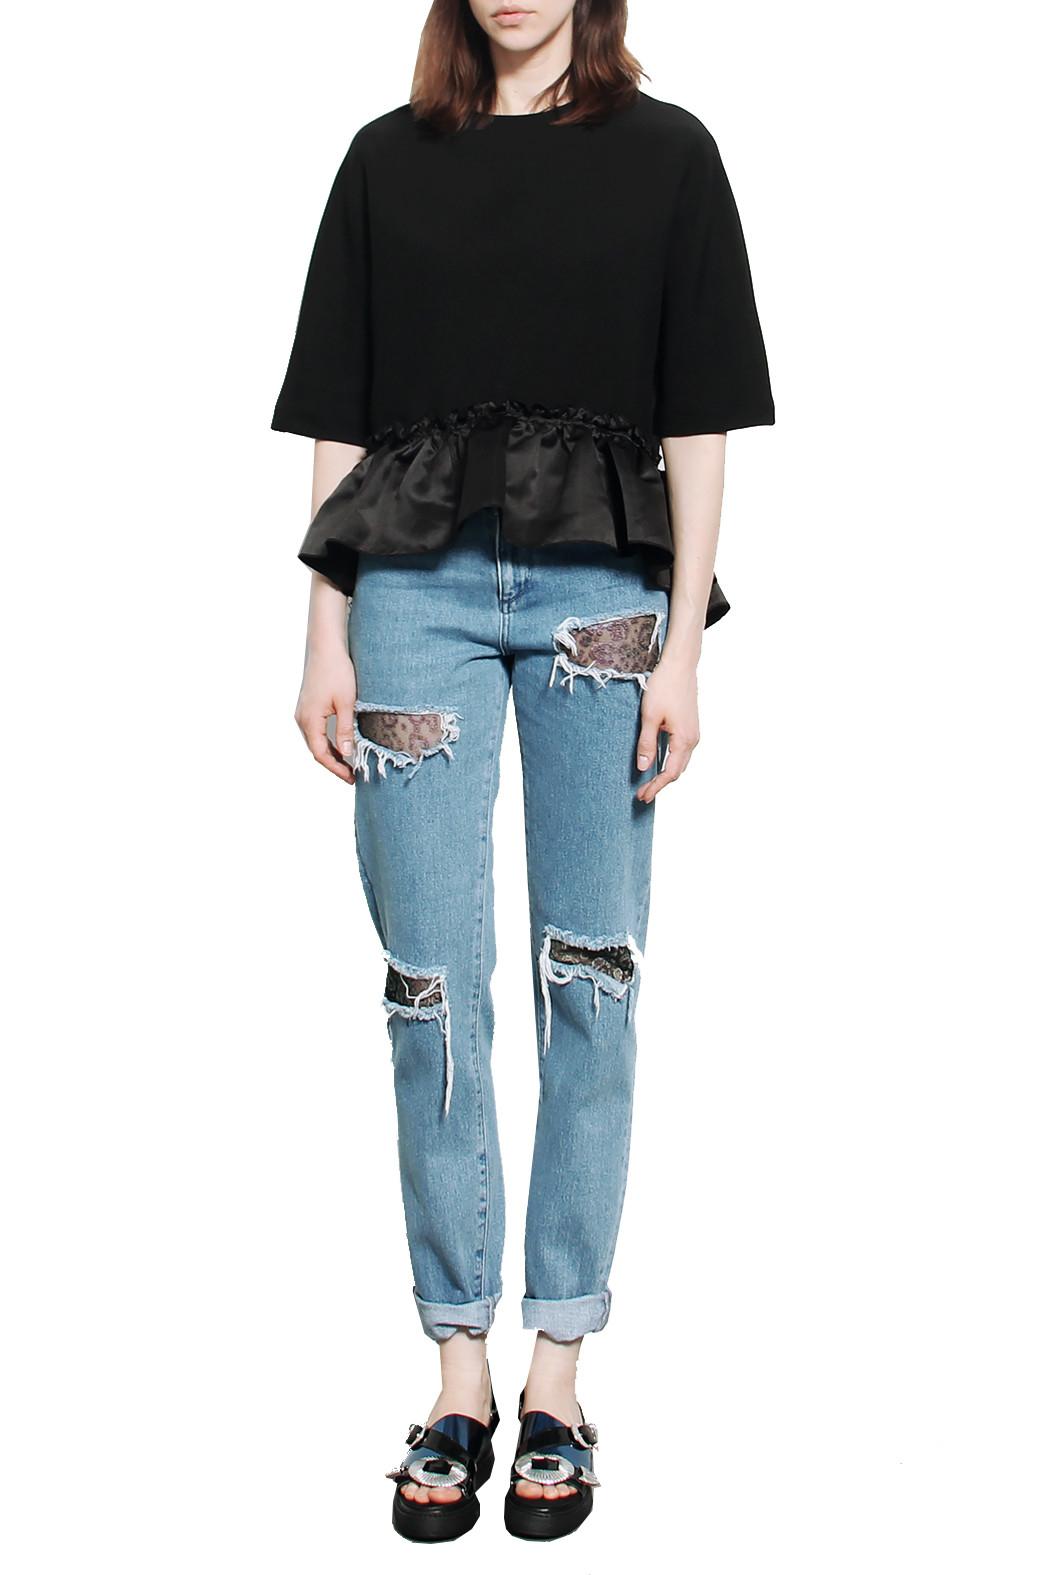 House Of Holland 2015 Resort Lace Denim Jeans In Blue Denim Lyst